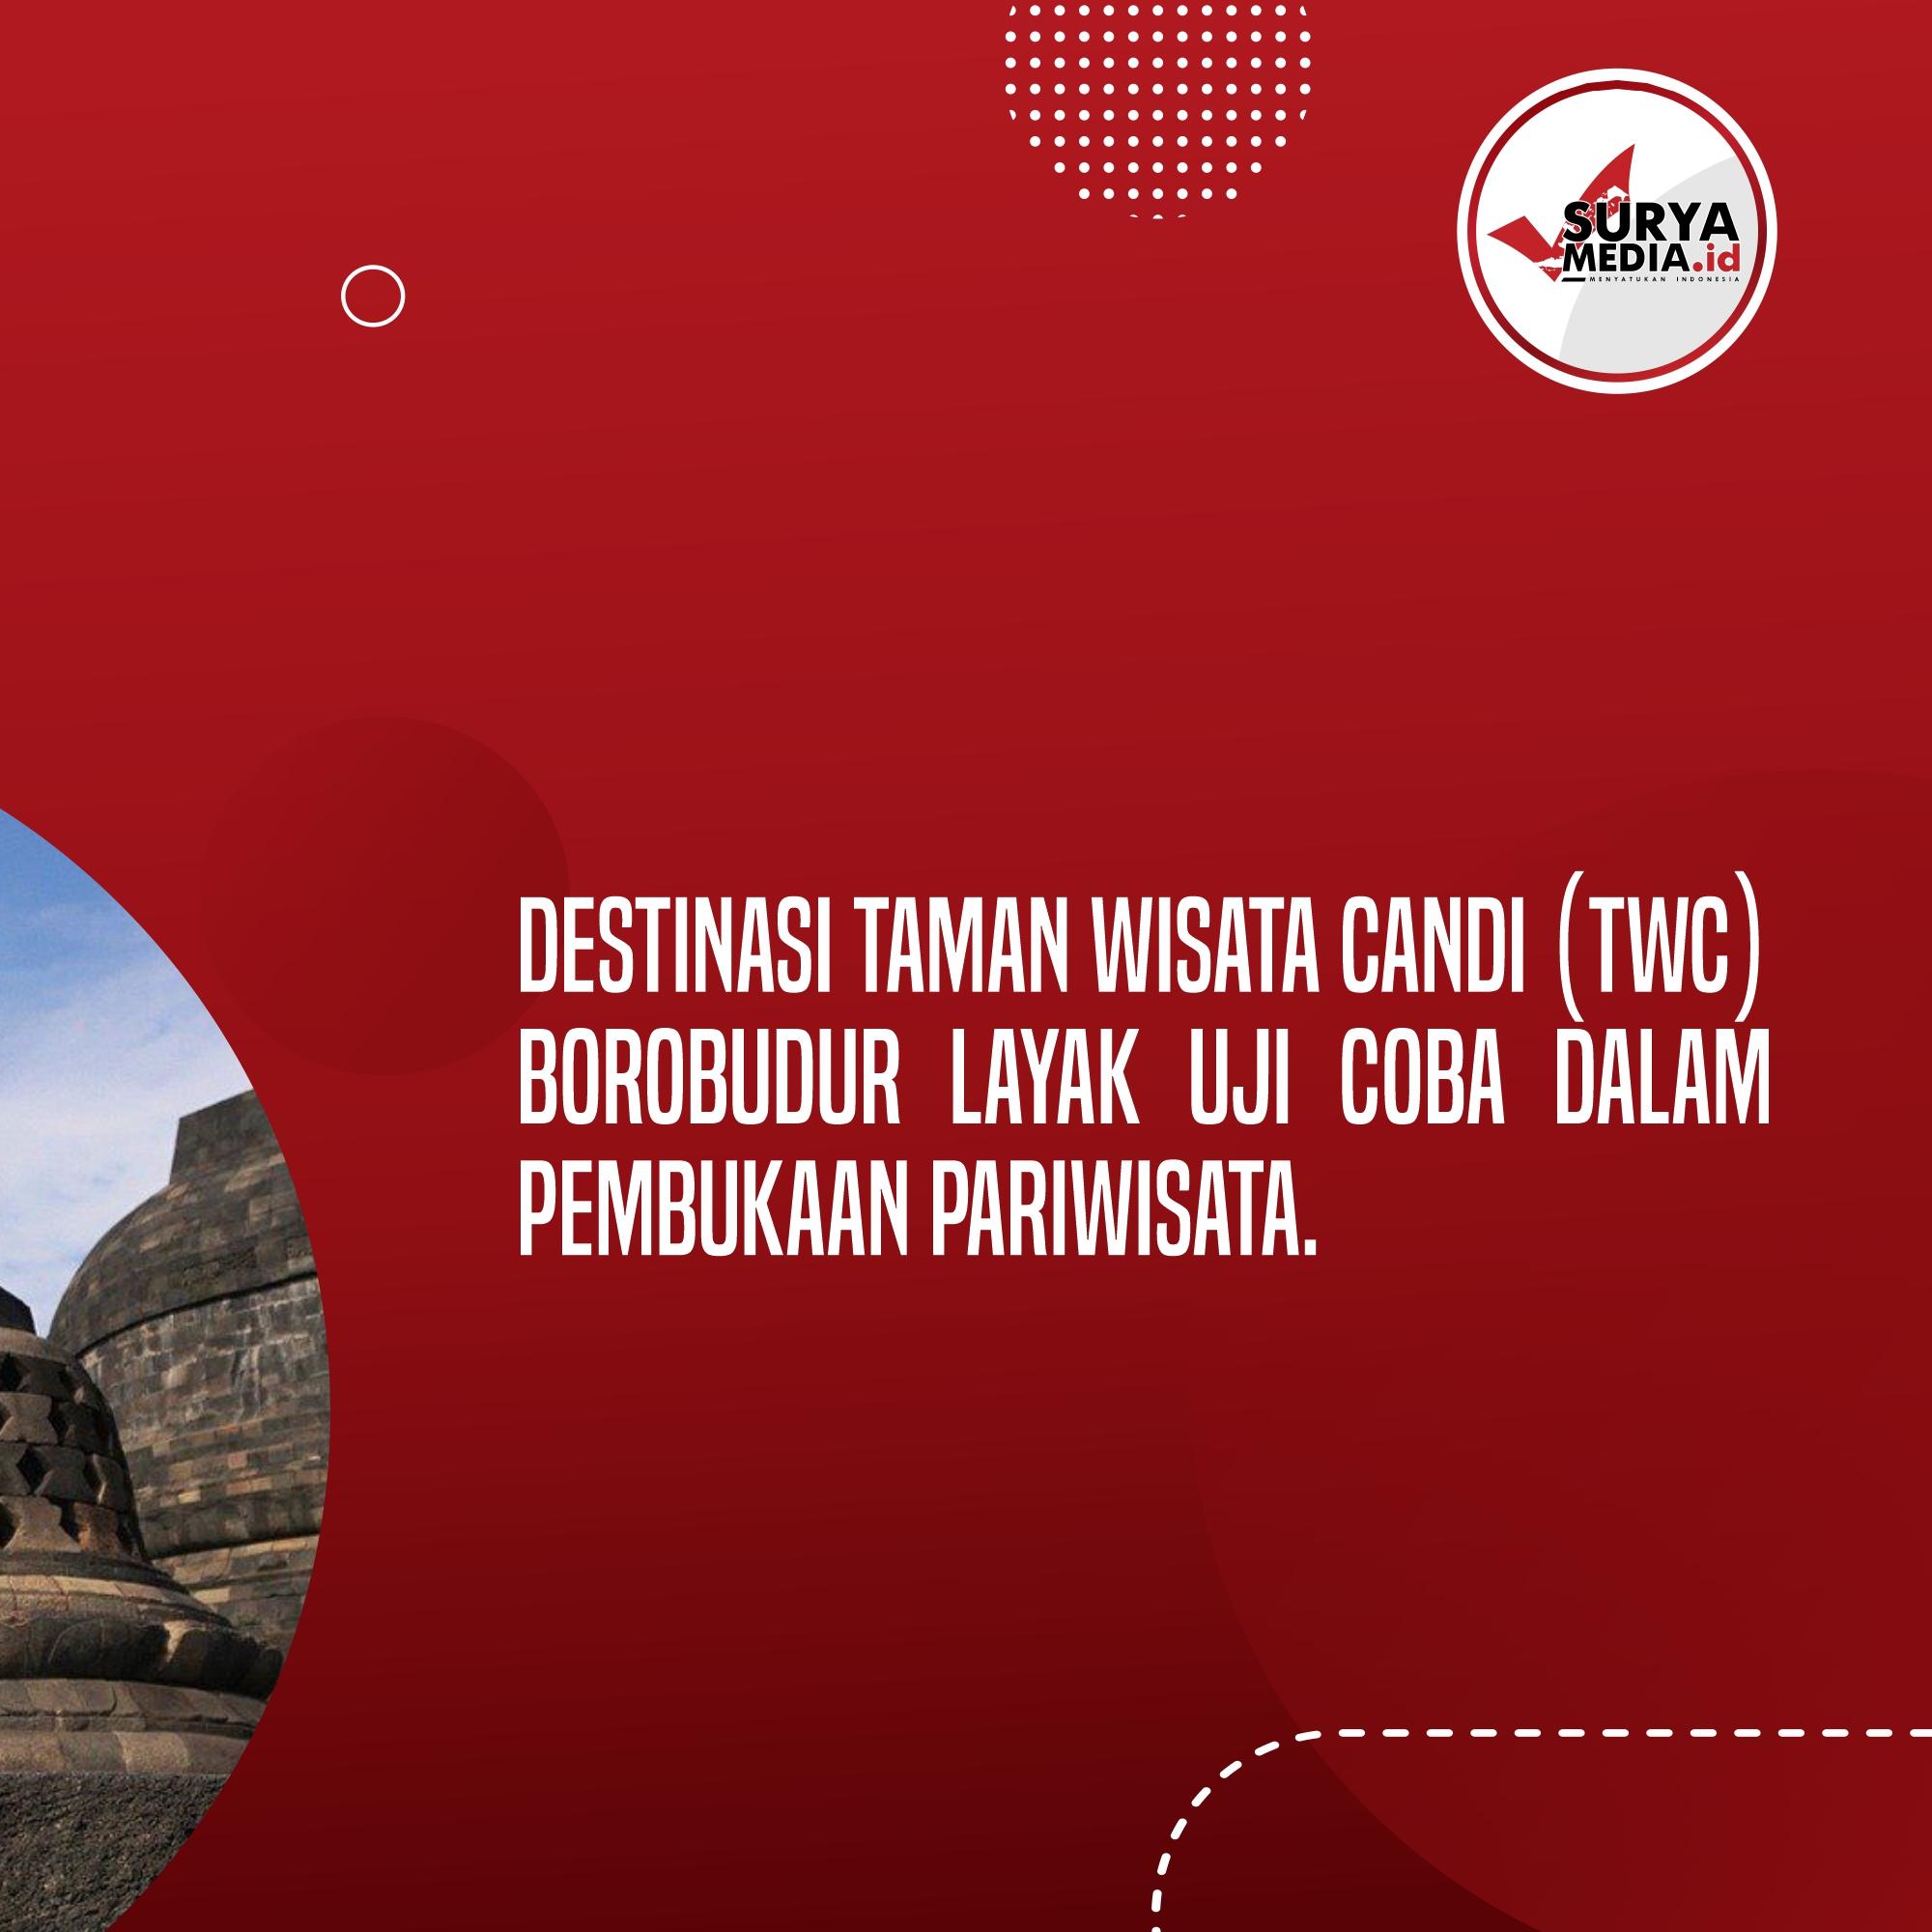 Candi Borobudur Layak Uji Coba Pembukaan Pariwisata